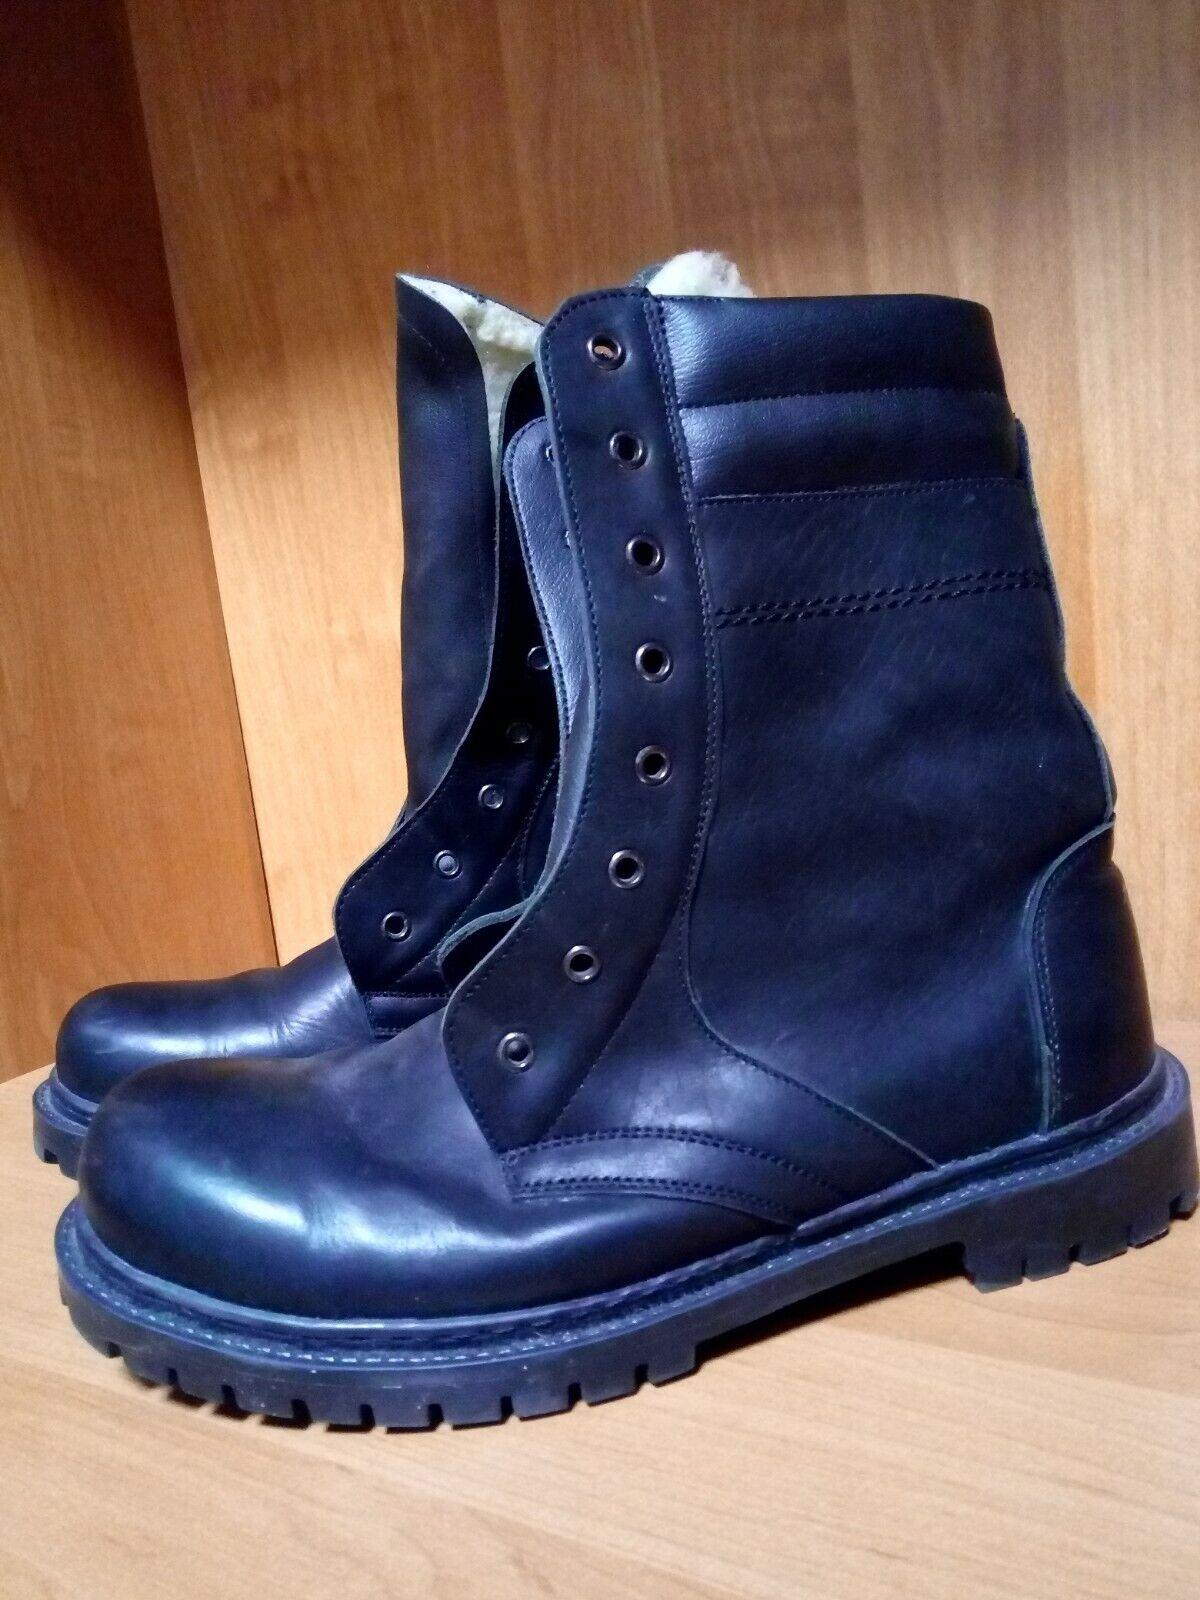 Warm Leather Combat Boots * Ukraine